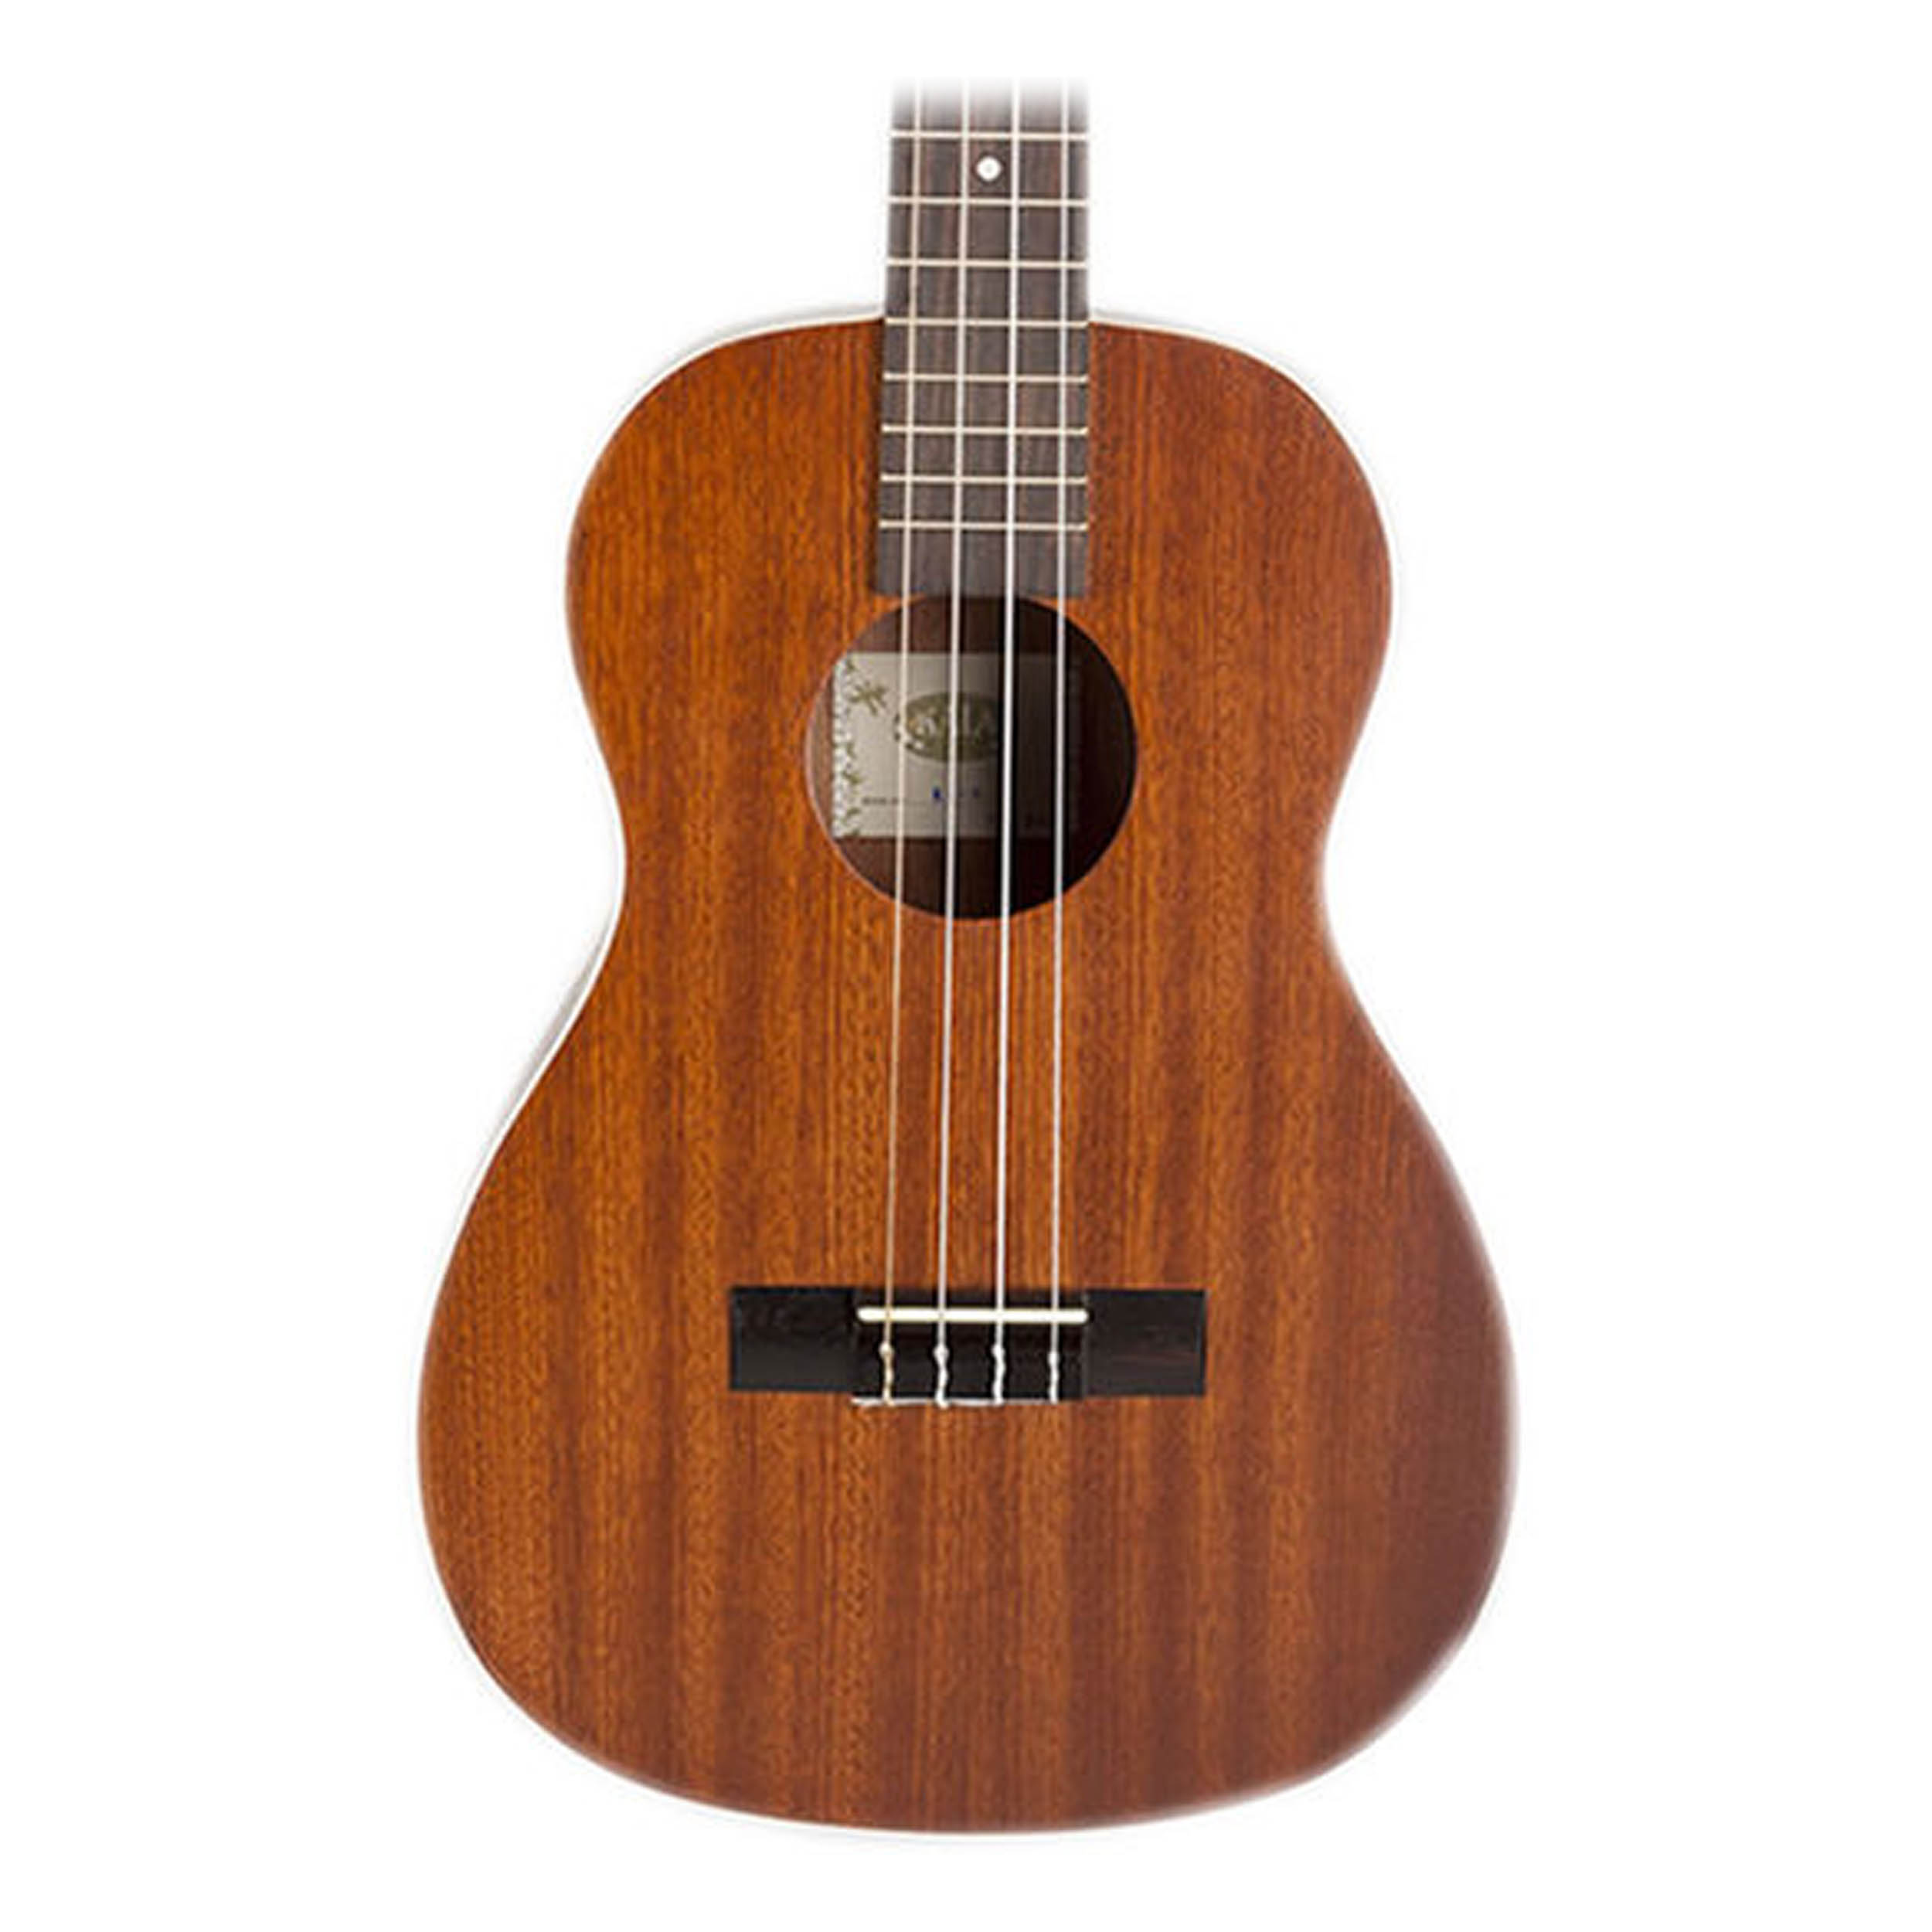 kala ka b baritone mahogany ukulele ebay. Black Bedroom Furniture Sets. Home Design Ideas